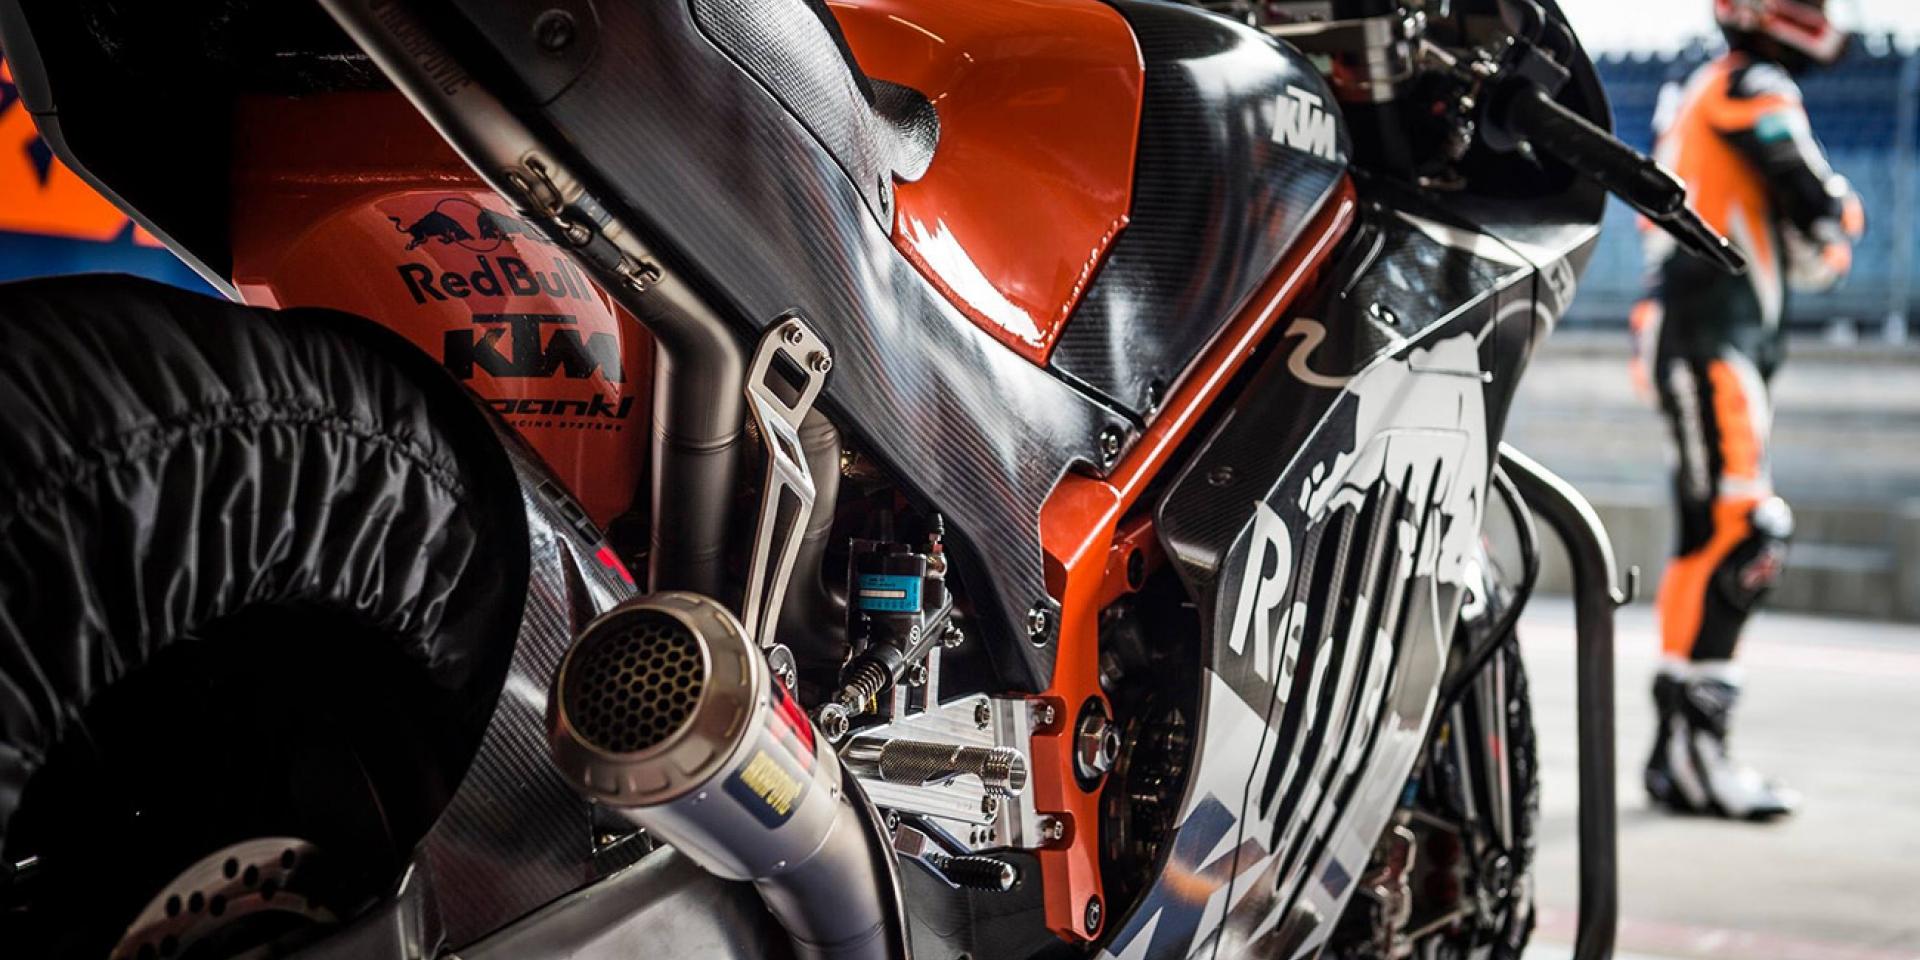 Ready to Race。KTM首度公開測試2017 MOTOGP戰車RC16